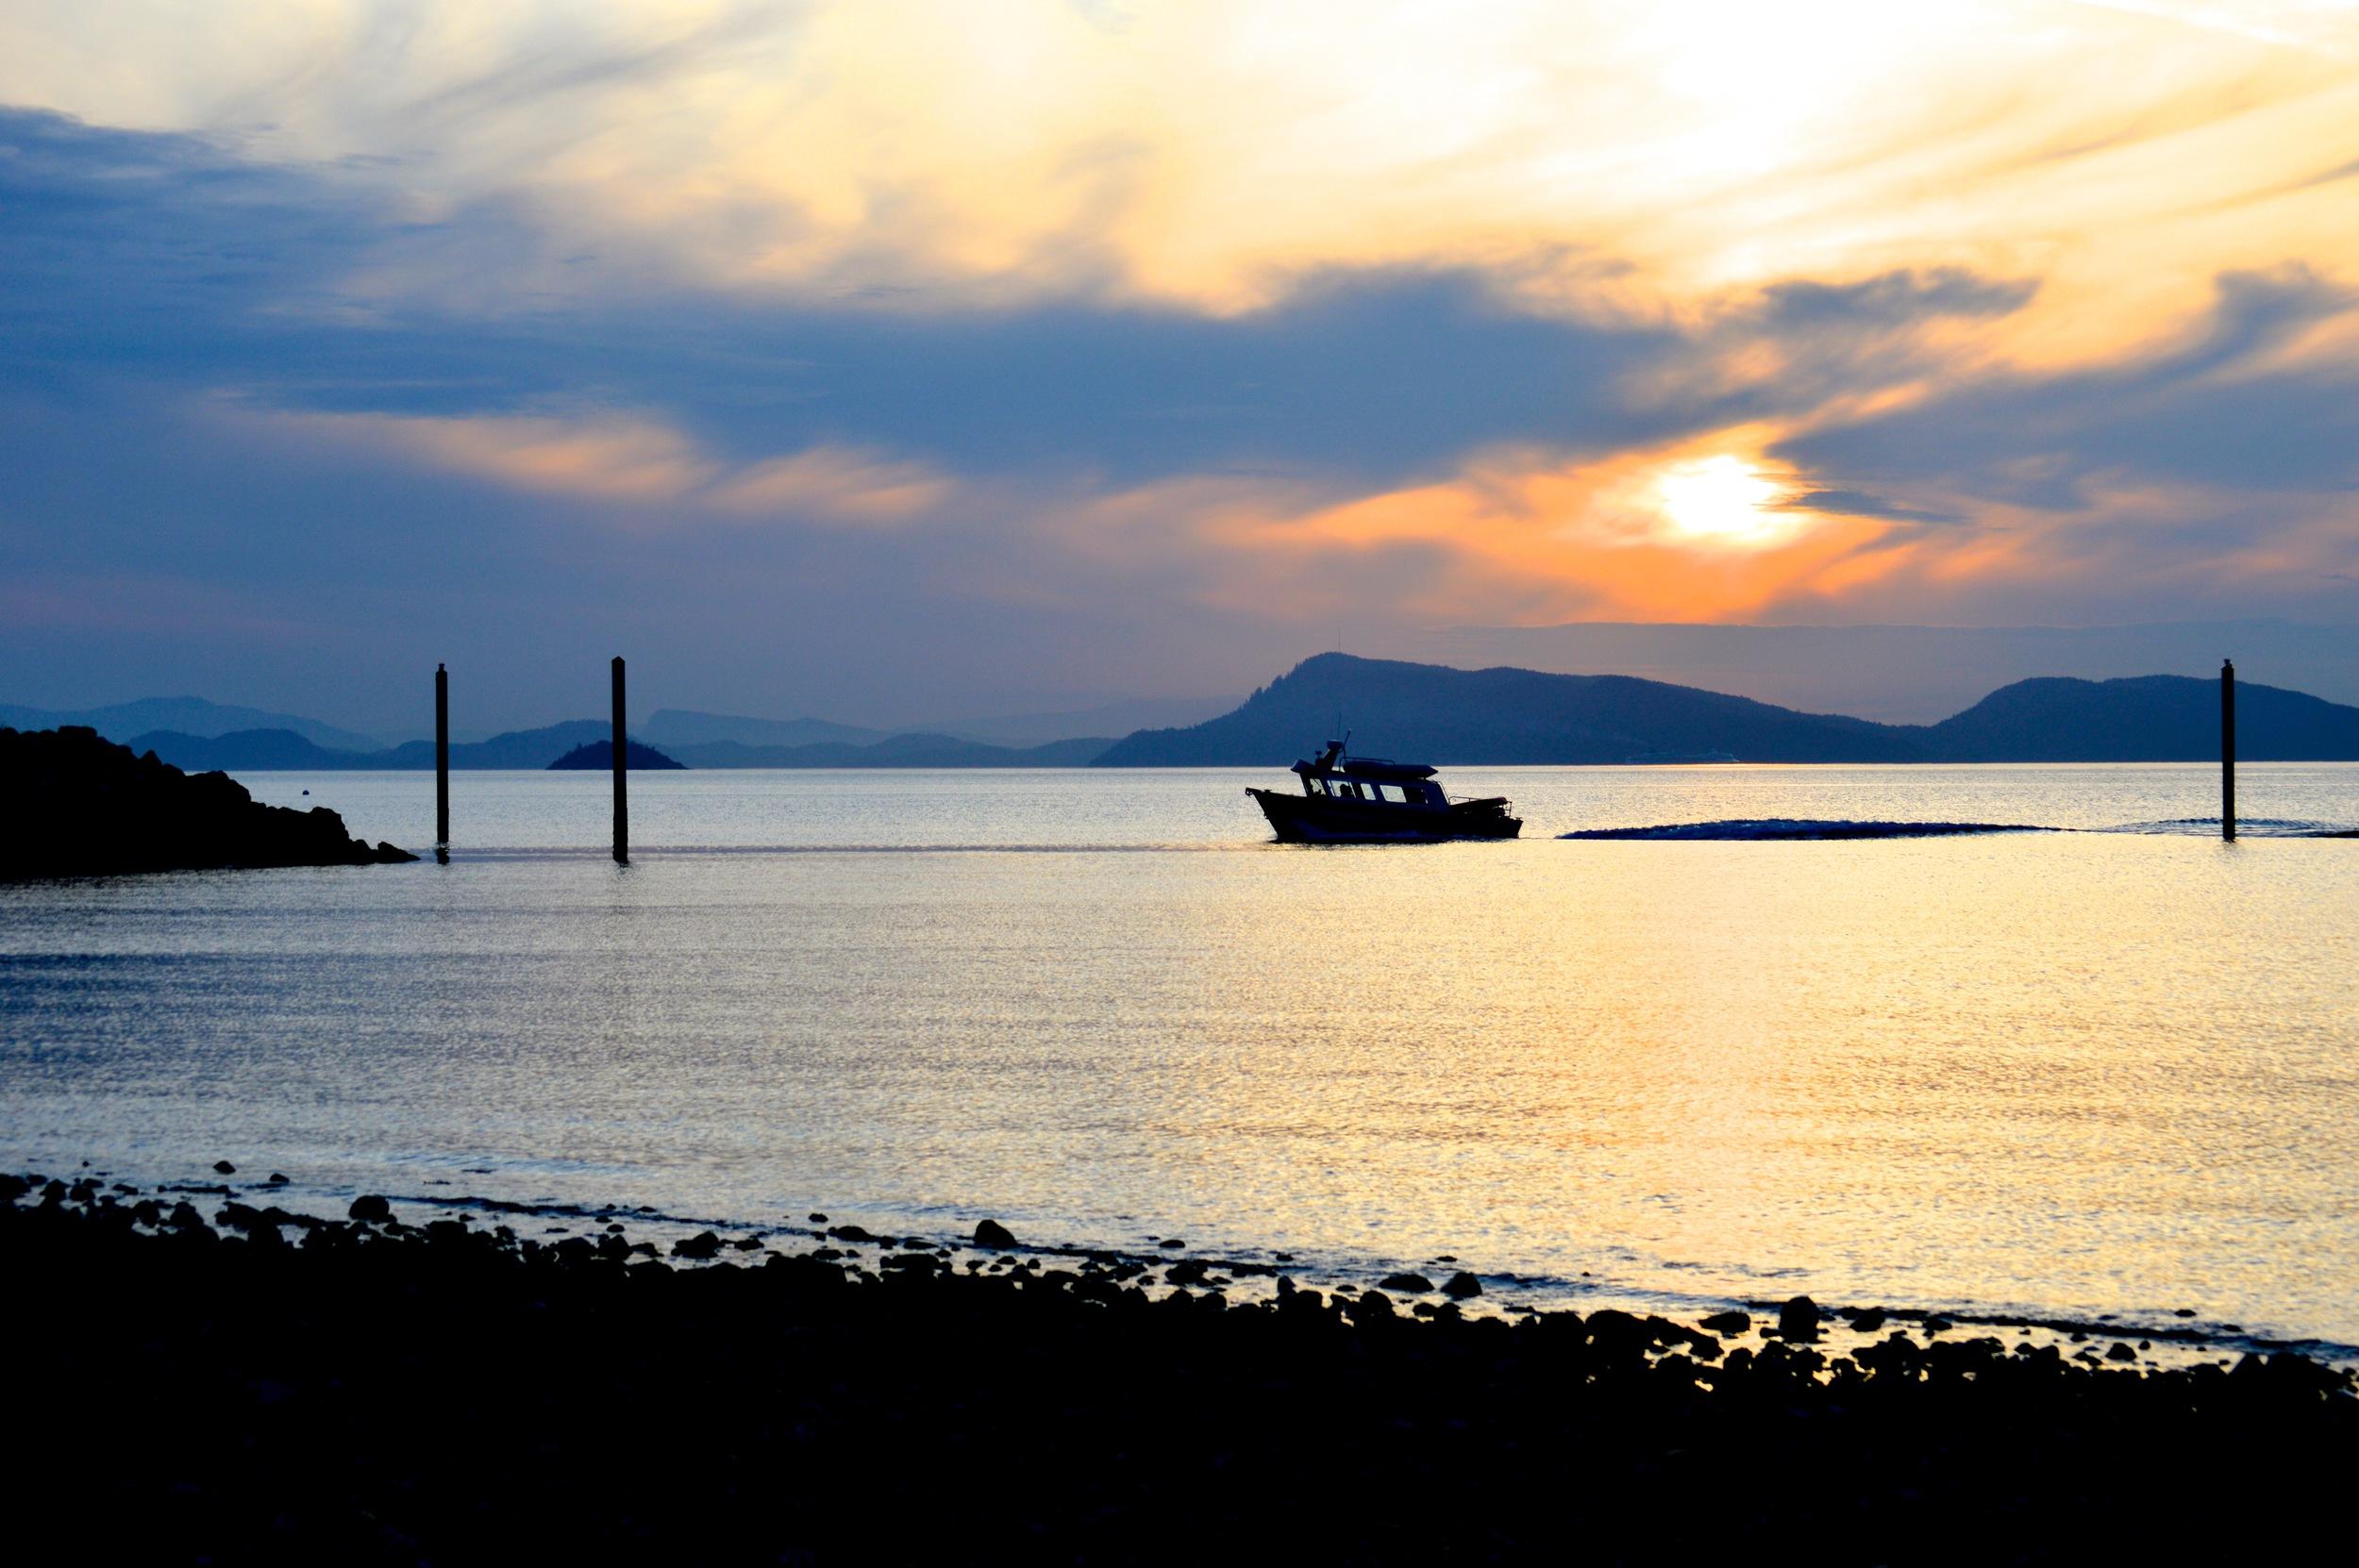 Boat returning at Sunset on Orcas Island